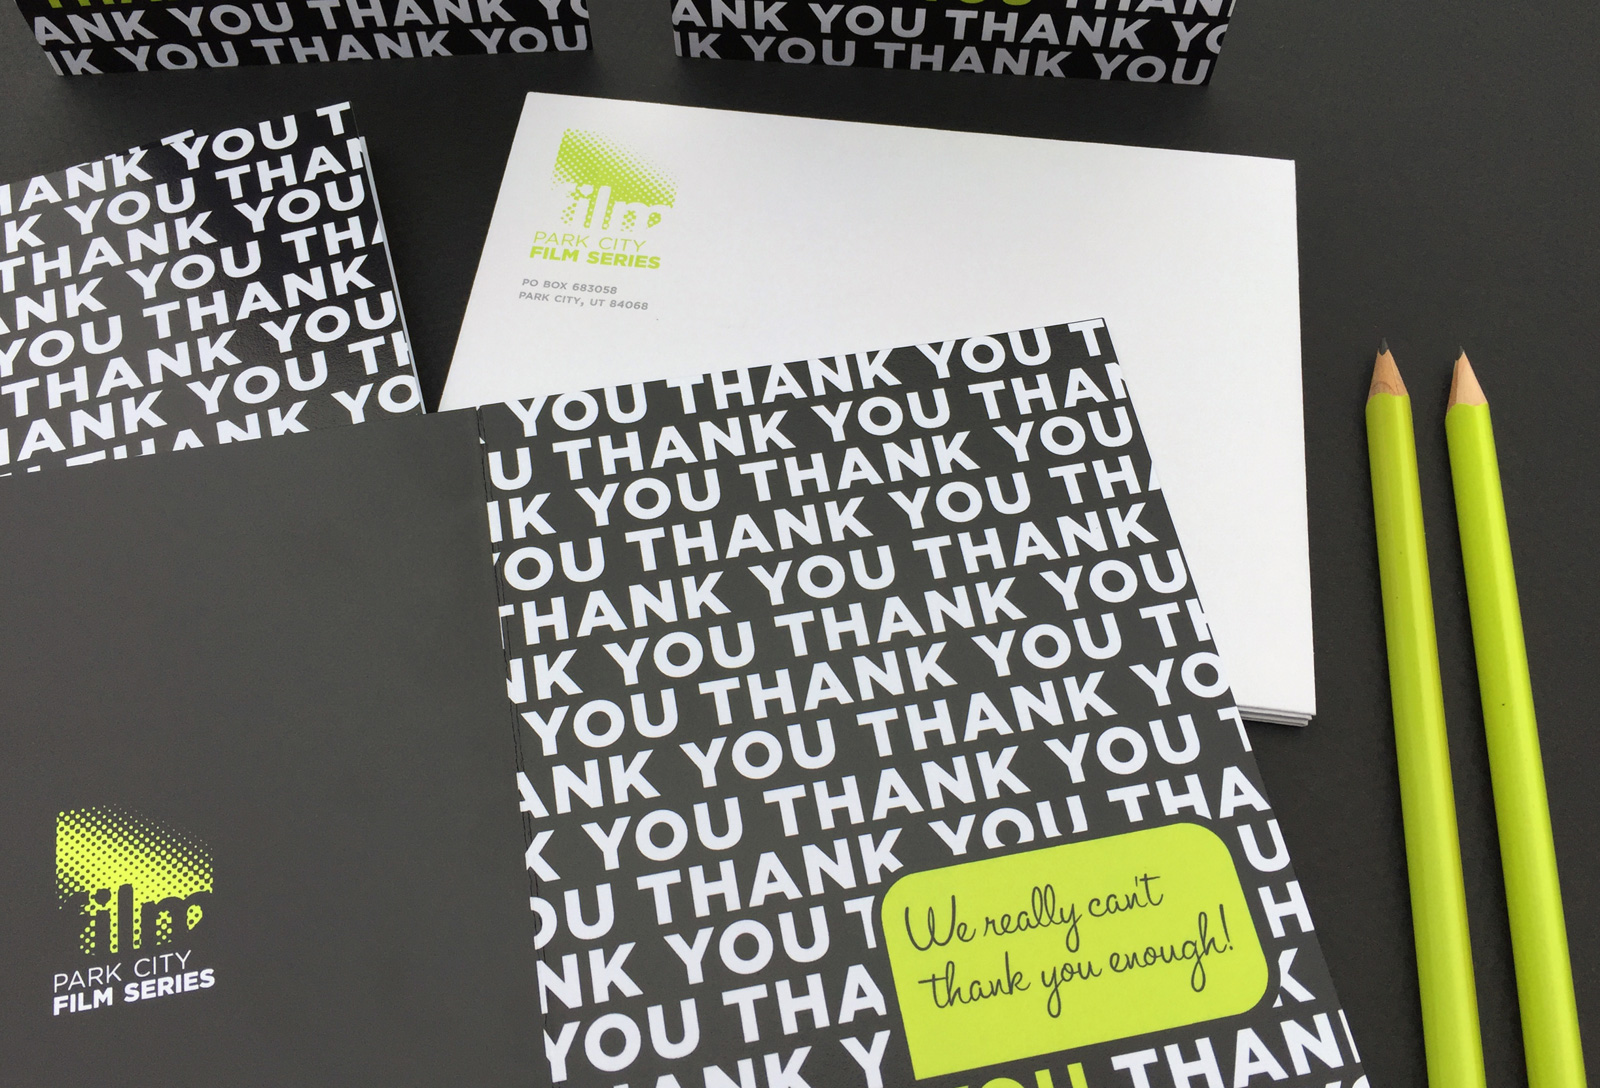 Thank you card + envelope